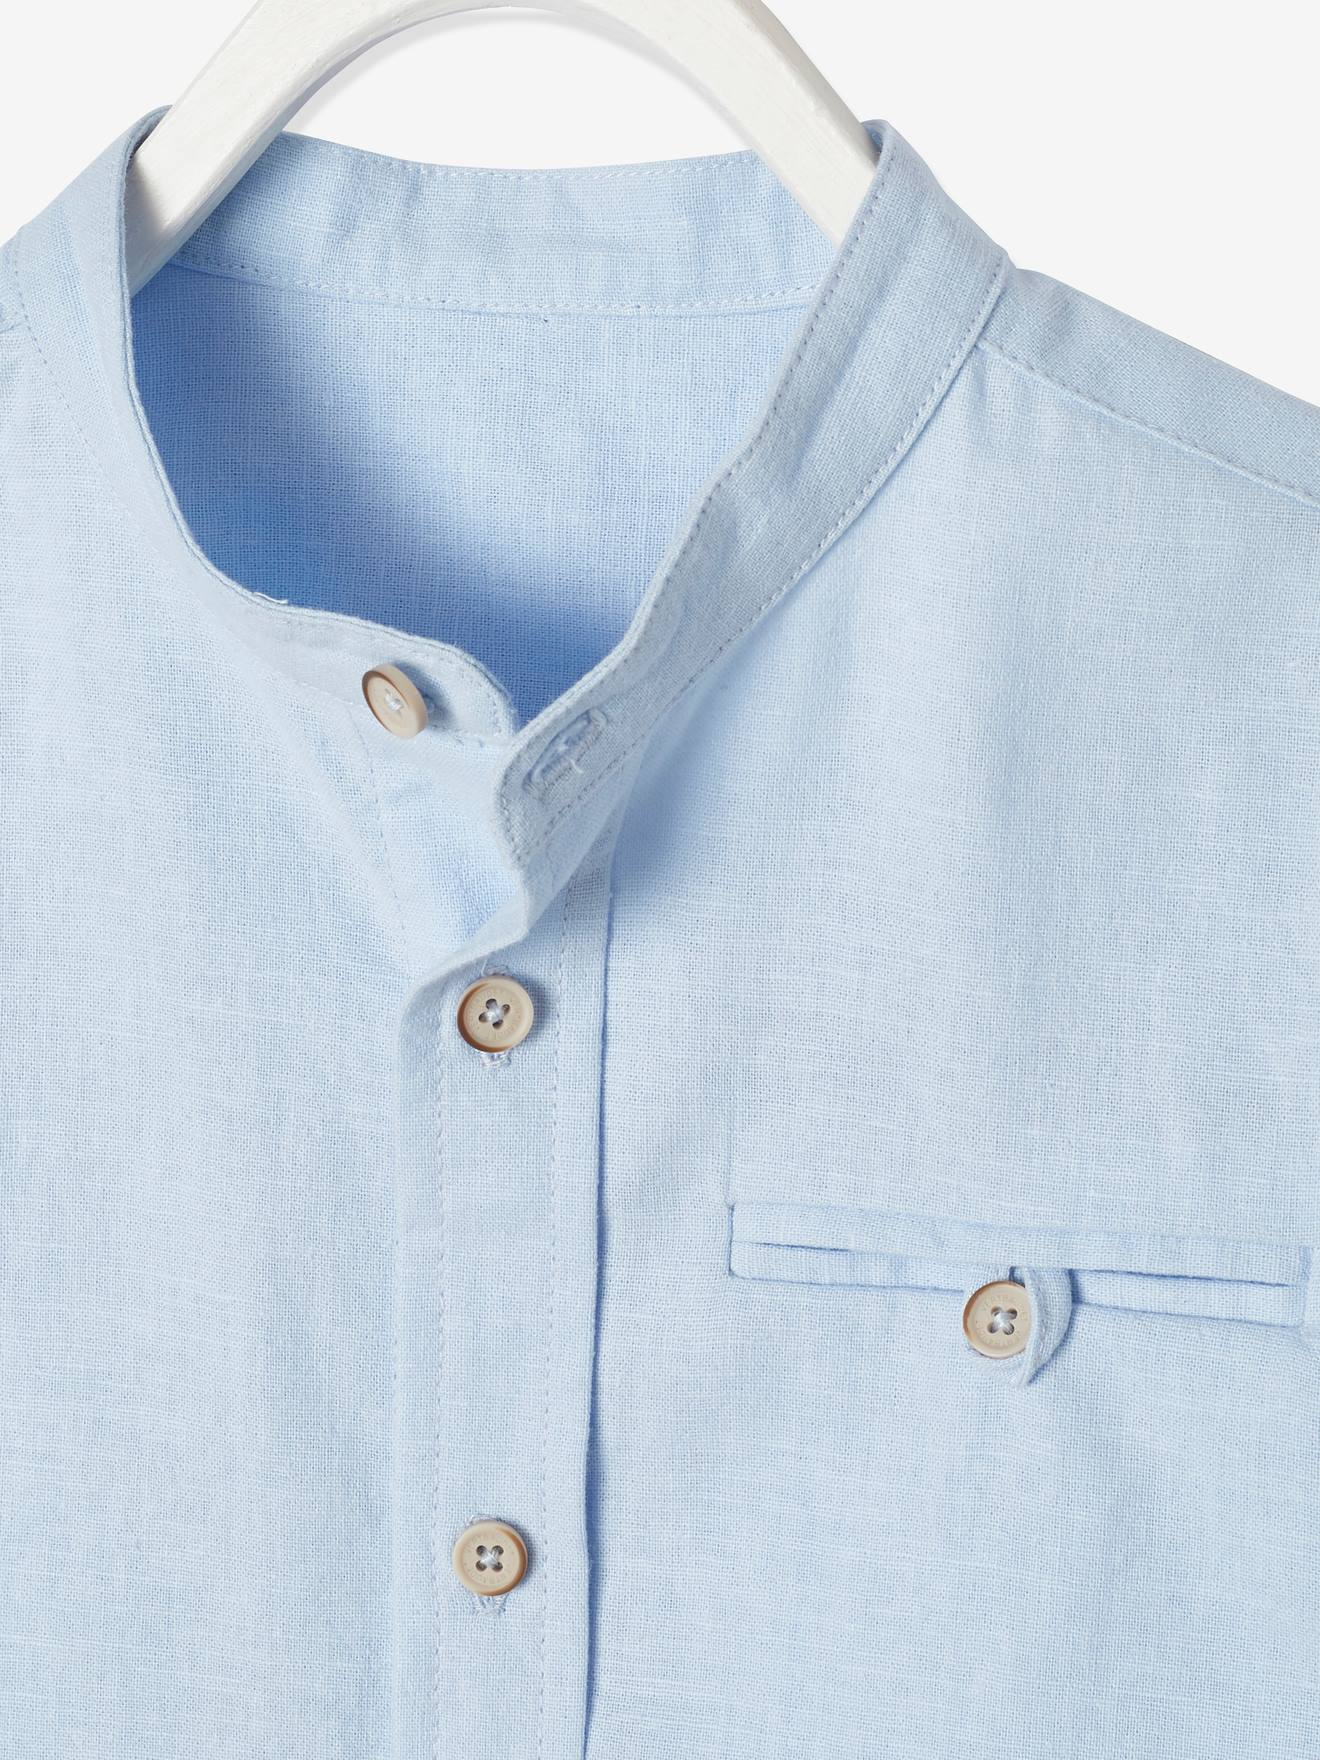 Chambre Bleu Ciel Et Lin chemise col mao garçon en coton/ lin manches courtes - bleu ciel, garçon